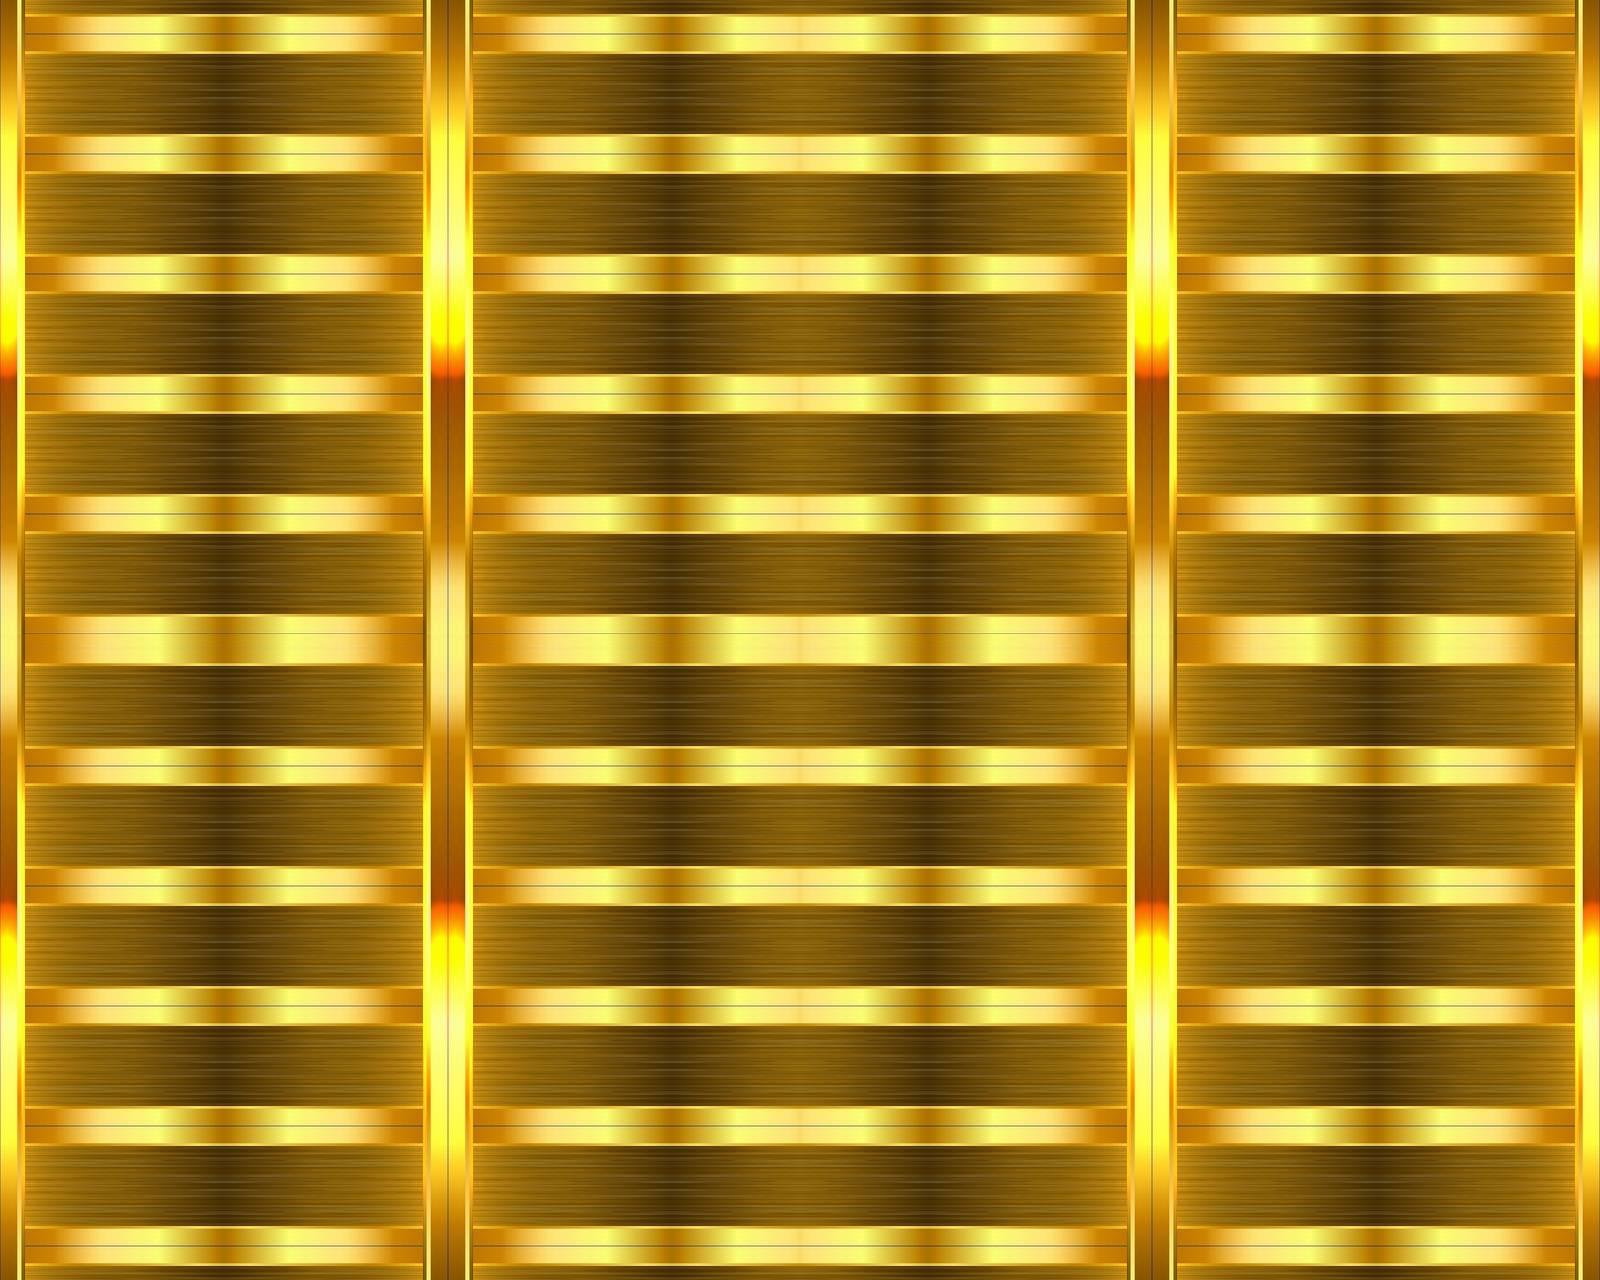 Gold Screen